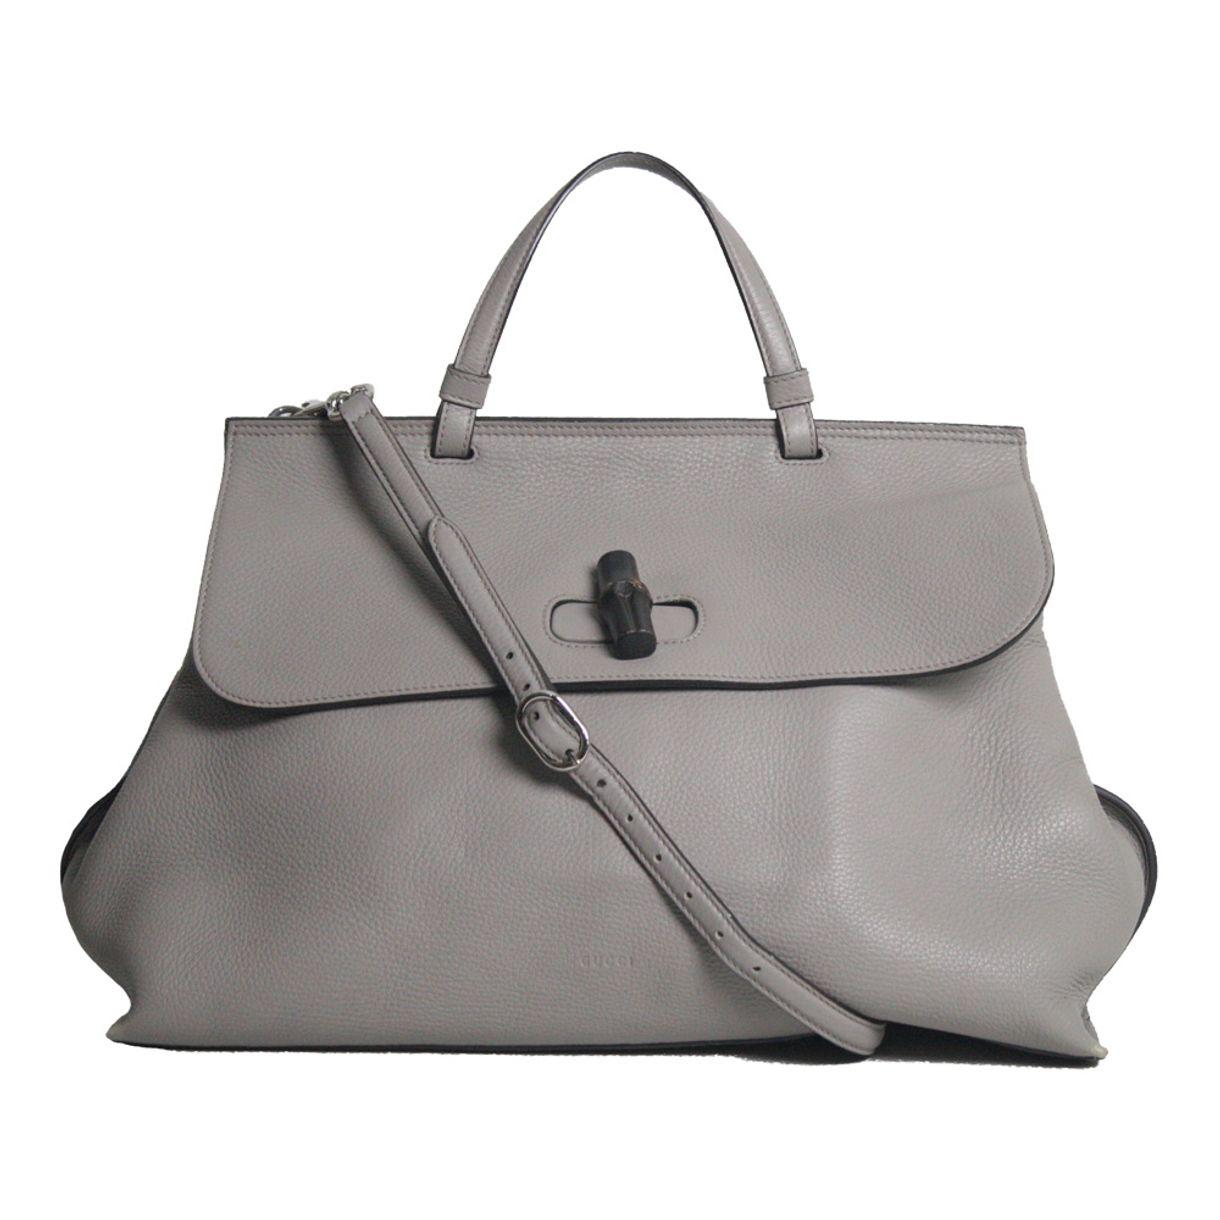 Bolsa-Gucci-Bamboo-Daily-Bag-Cinza